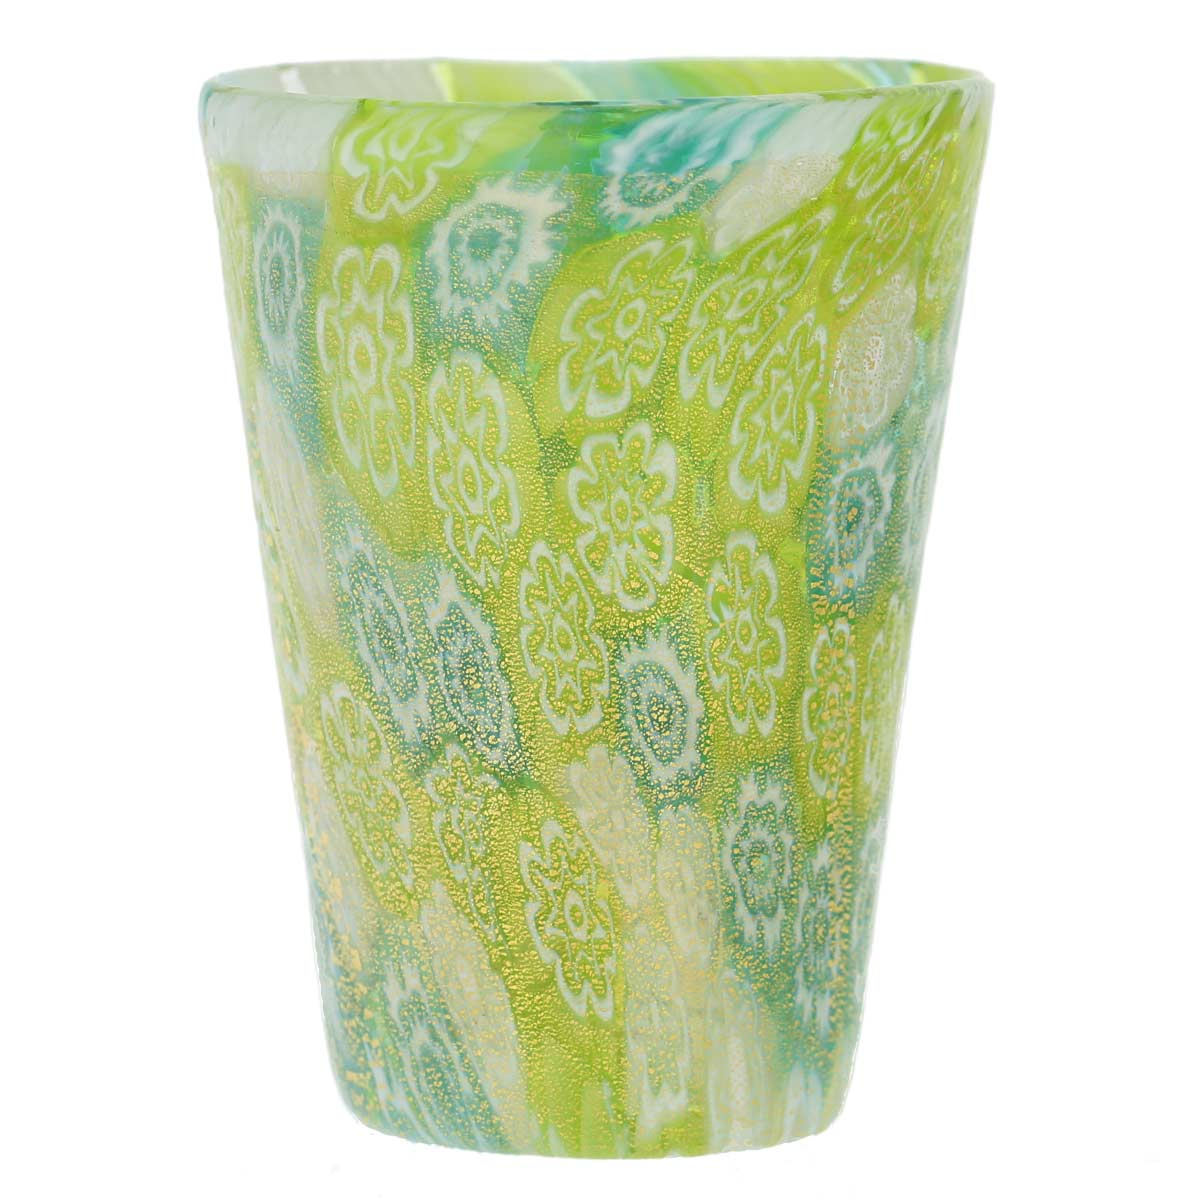 Murano Millefiori Shot Glass - Green Gold